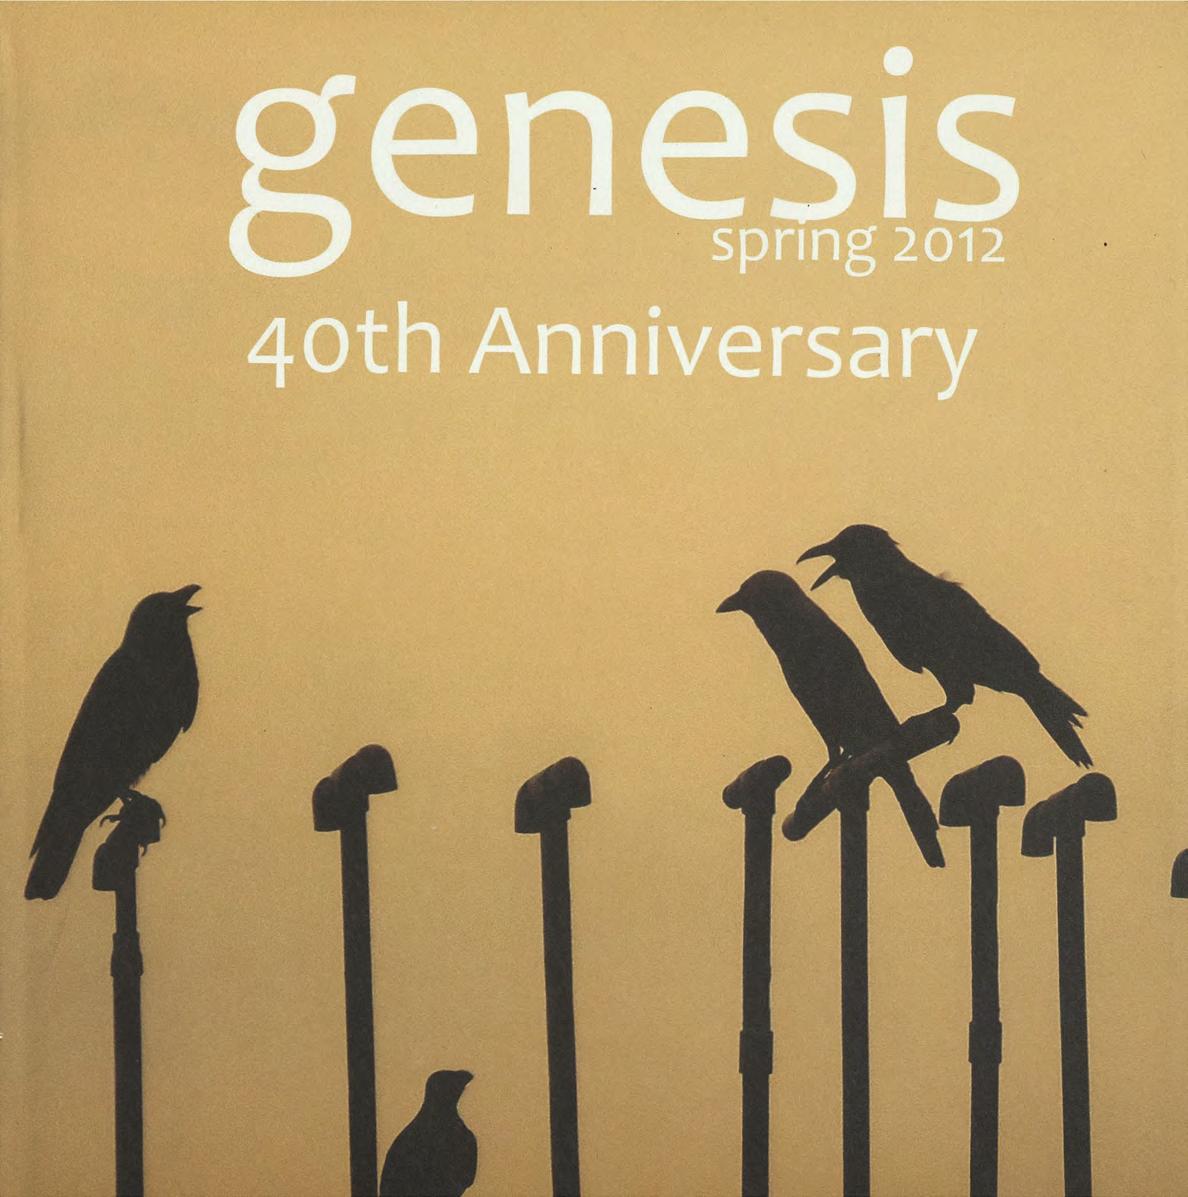 genesis spring 2012 cover